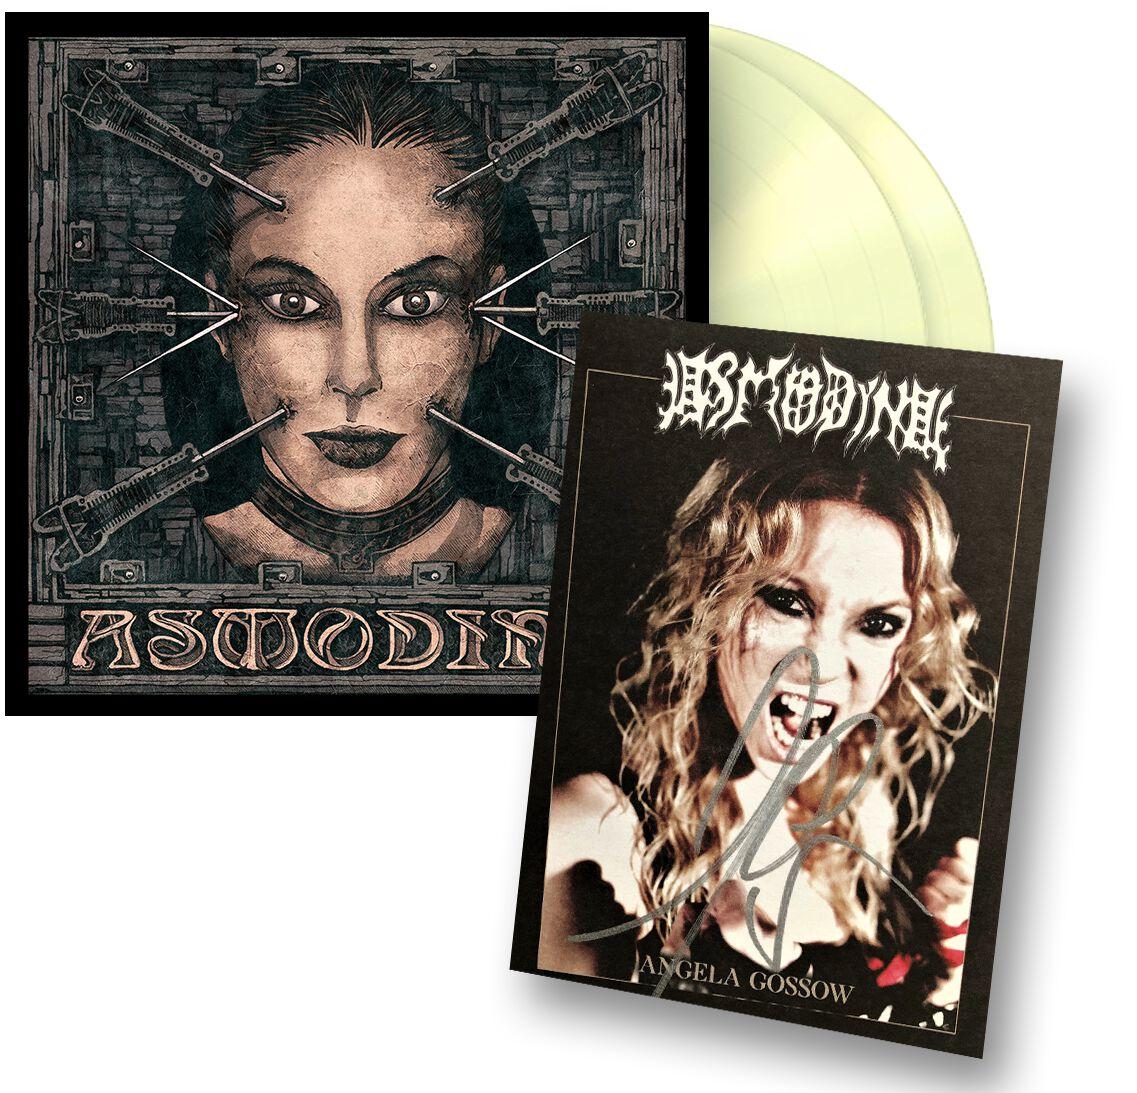 Asmodina Inferno (inkl. Autogrammkarte) LP glows in the dark GITD